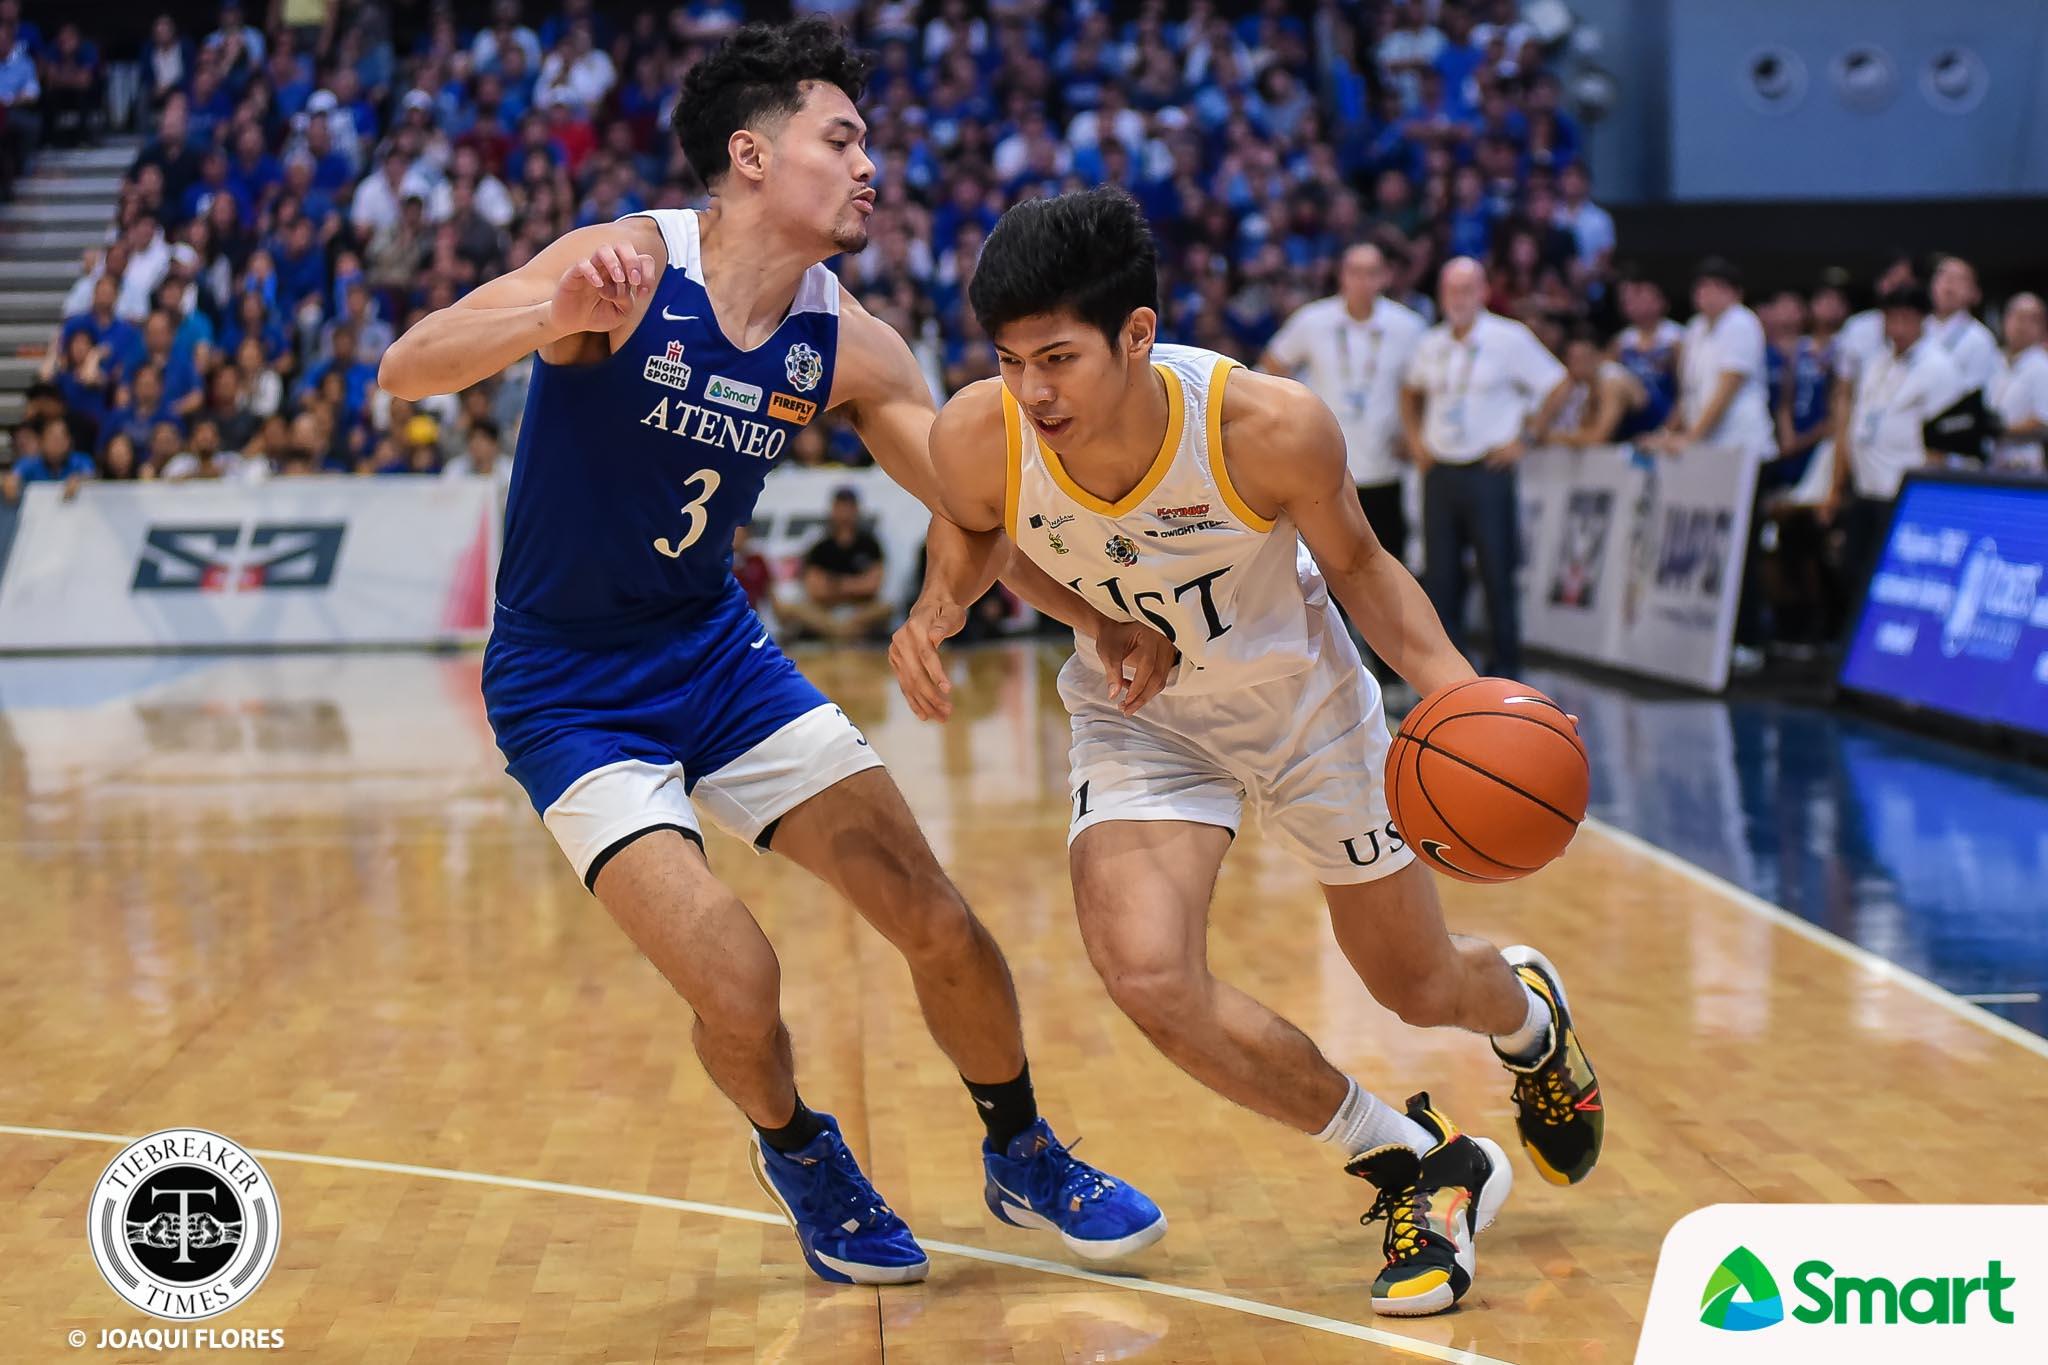 Tiebreaker Times UST, CJ Cansino part ways Basketball News UAAP UST  UST Men's Basketball UAAP Season 83 Men's Basketball UAAP Season 83 CJ Cansino